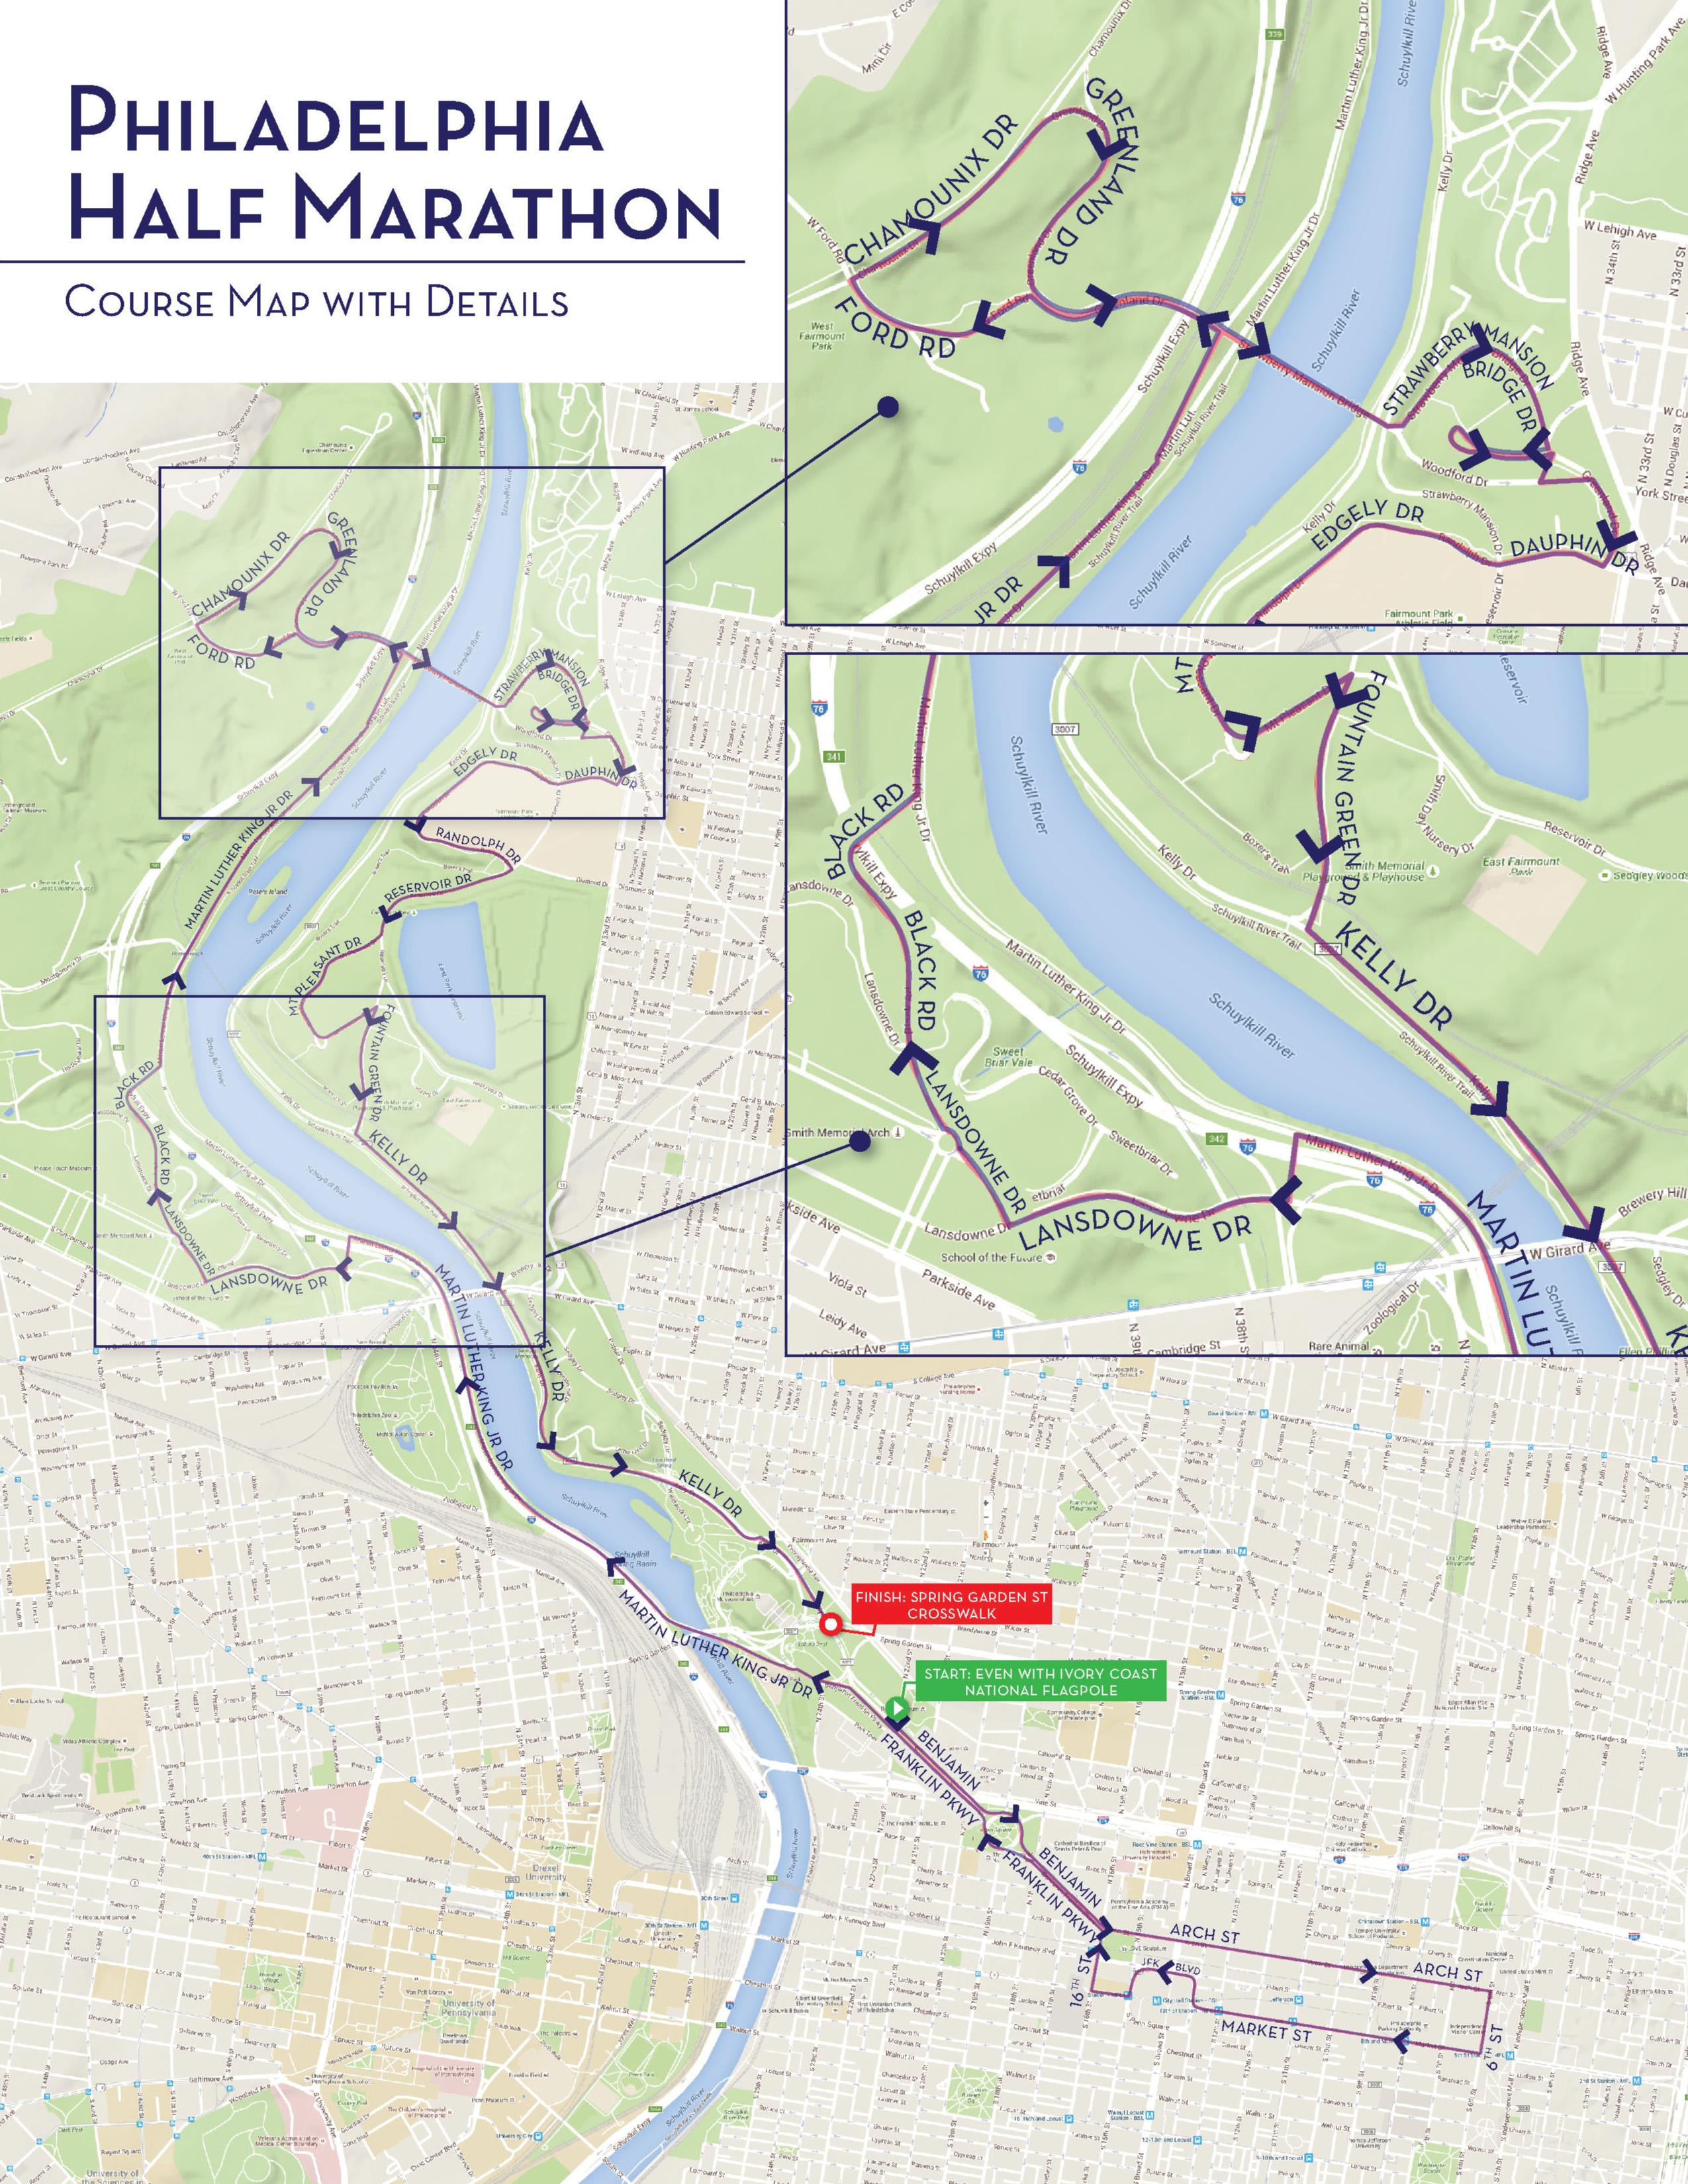 philadelphia marathon course map What The Philadelphia Marathon S Half Marathon Course Looks Like philadelphia marathon course map